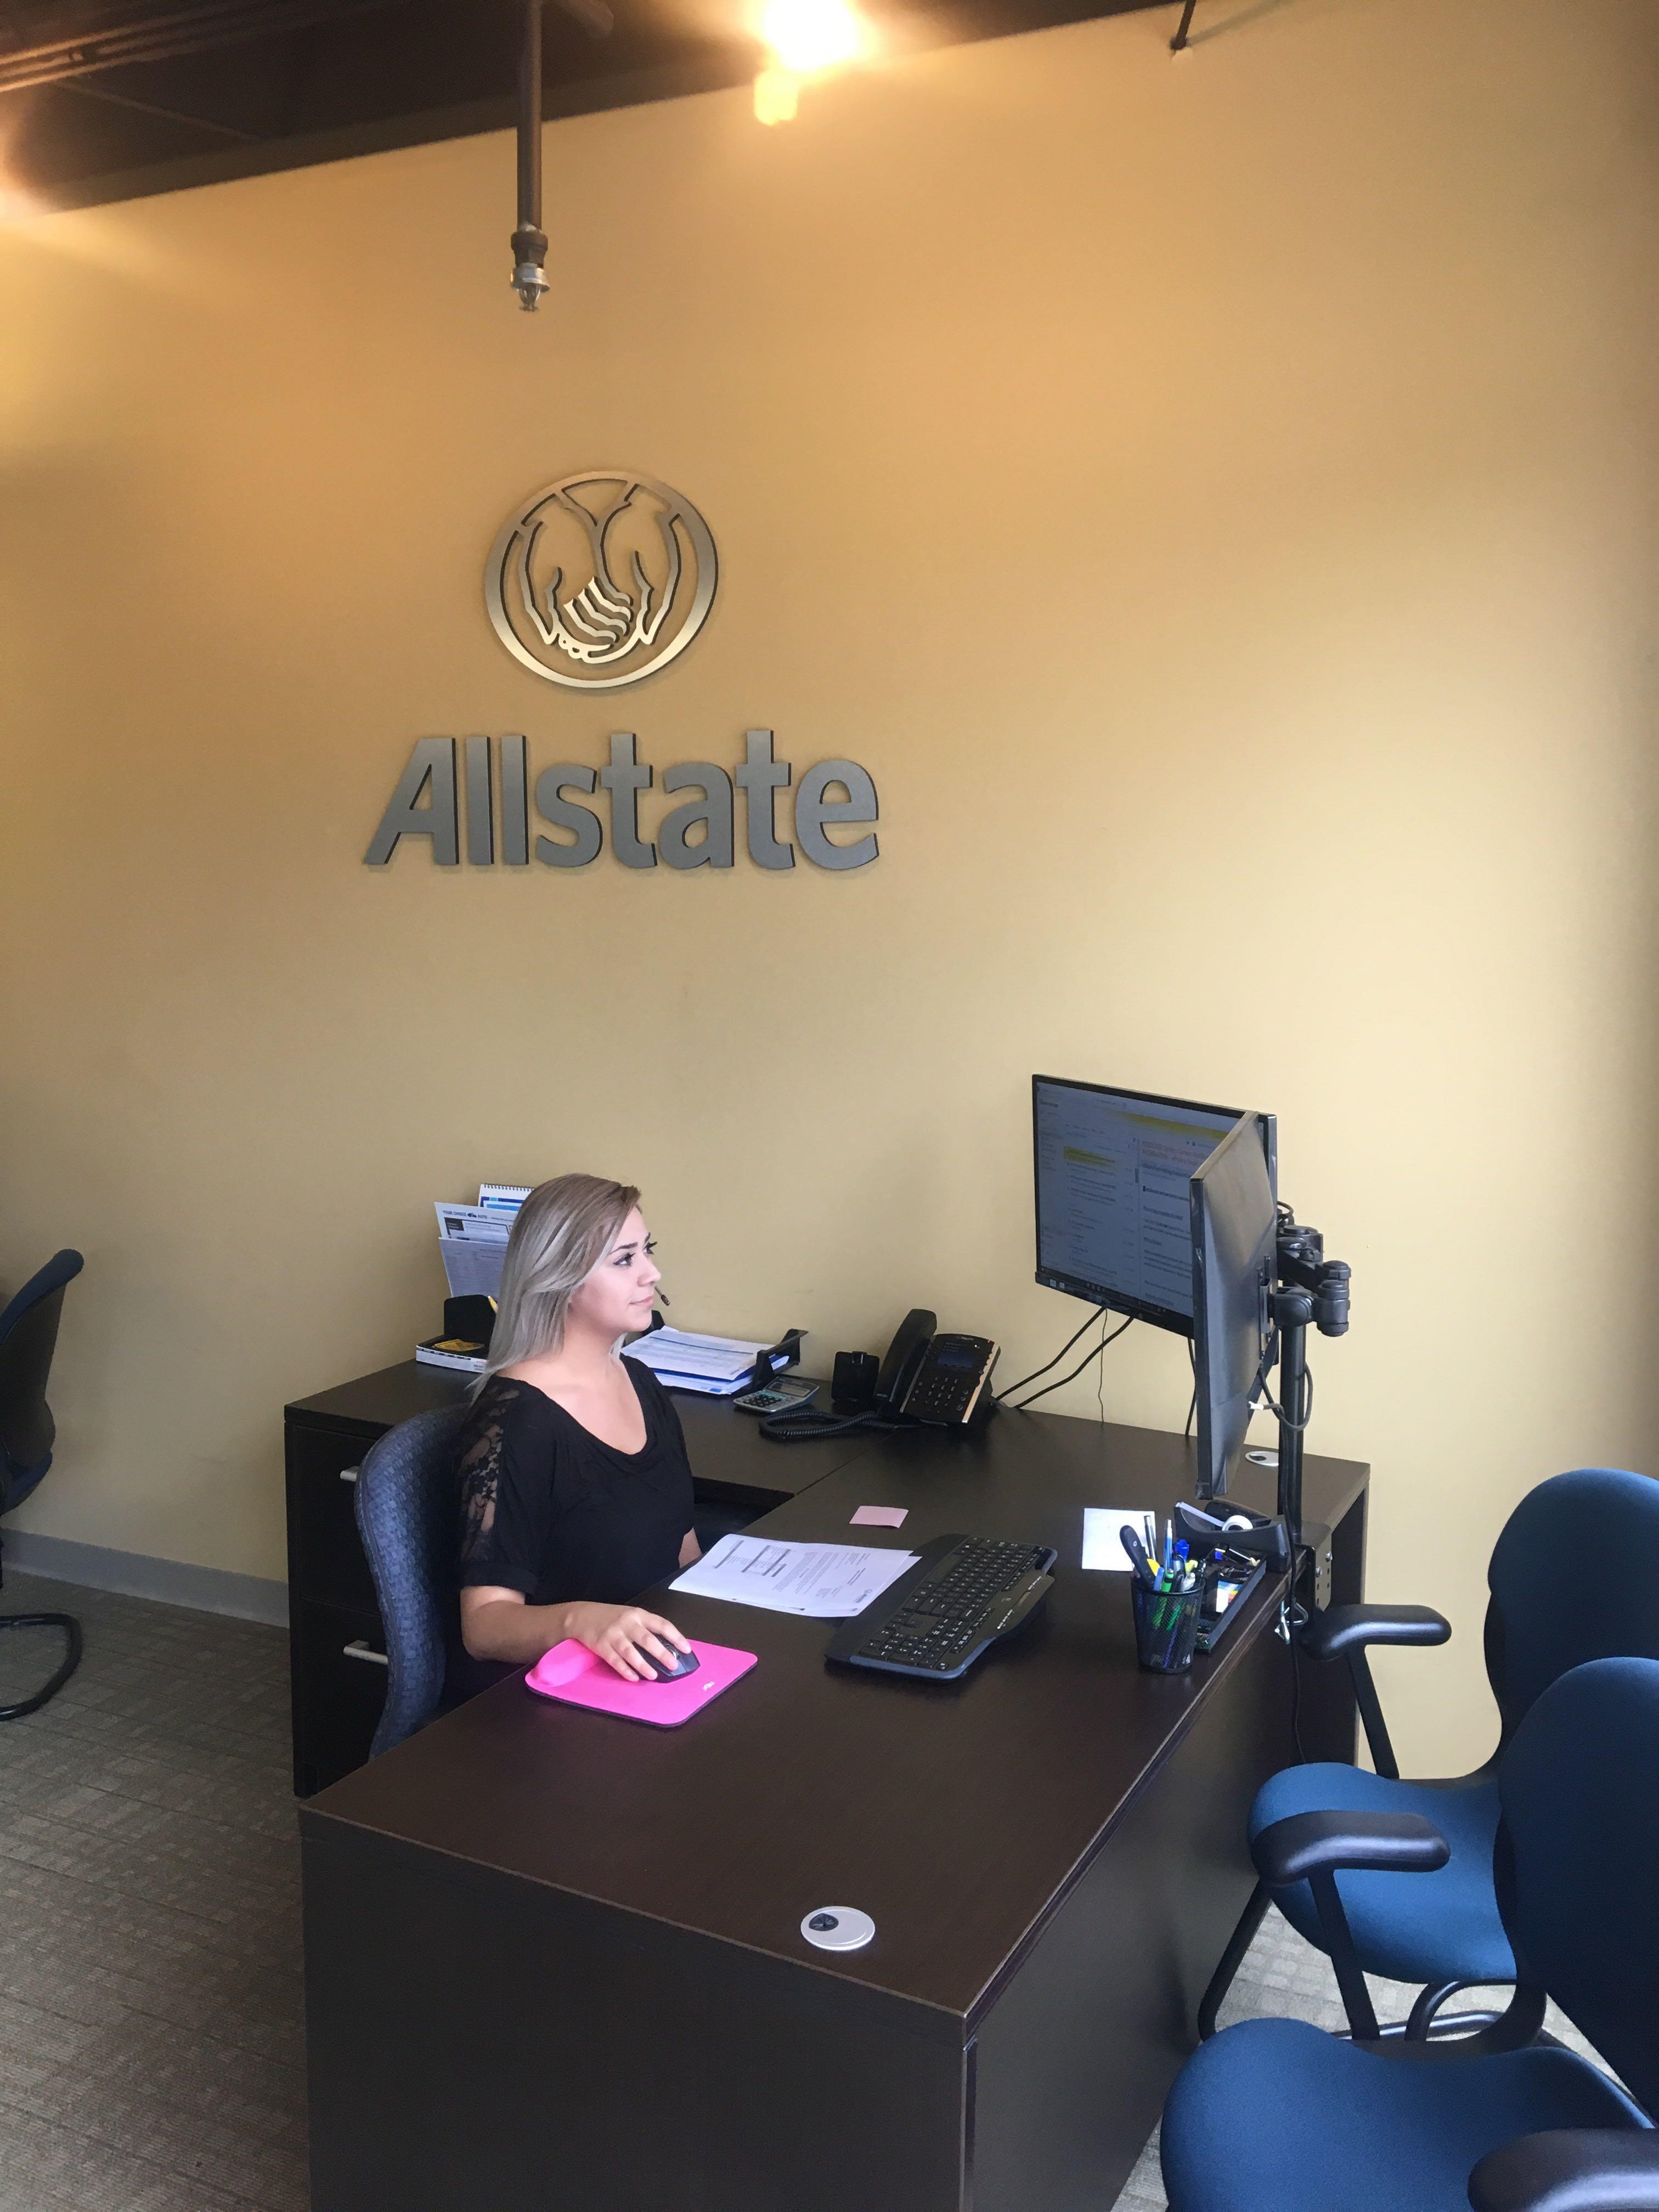 John Closterides: Allstate Insurance image 3